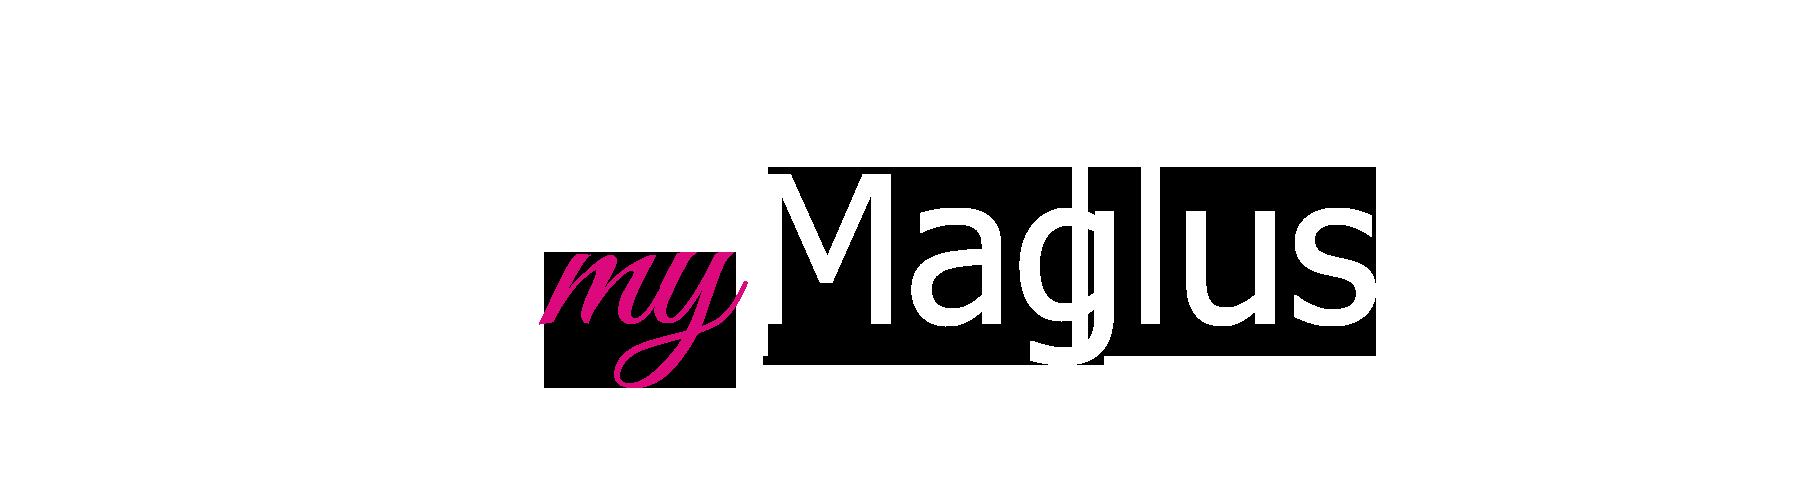 info.mymaglus.com